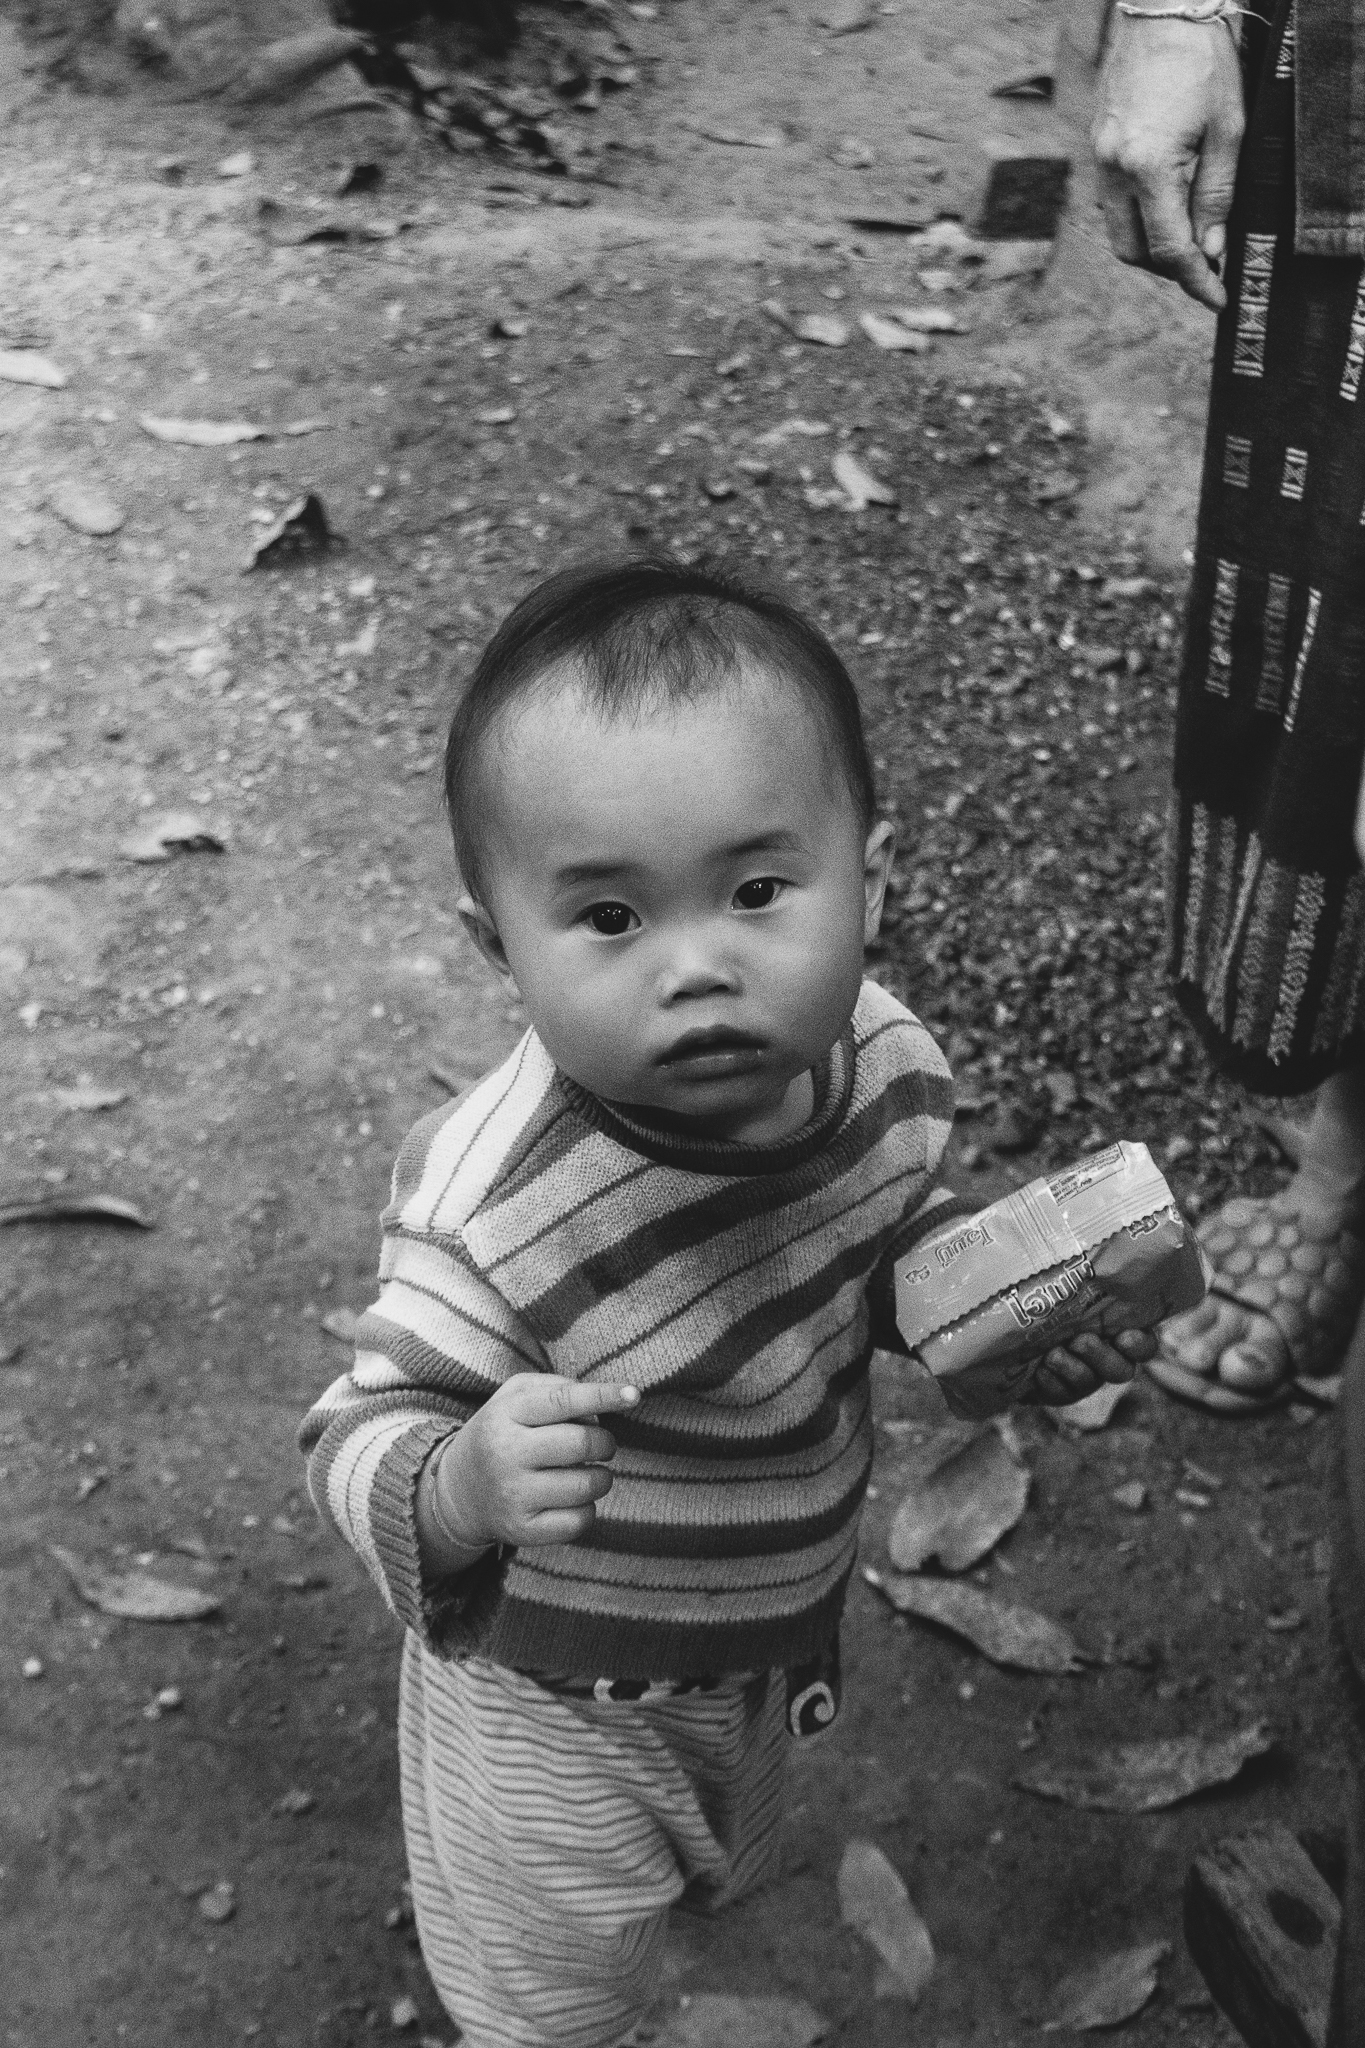 Laos - Bébé